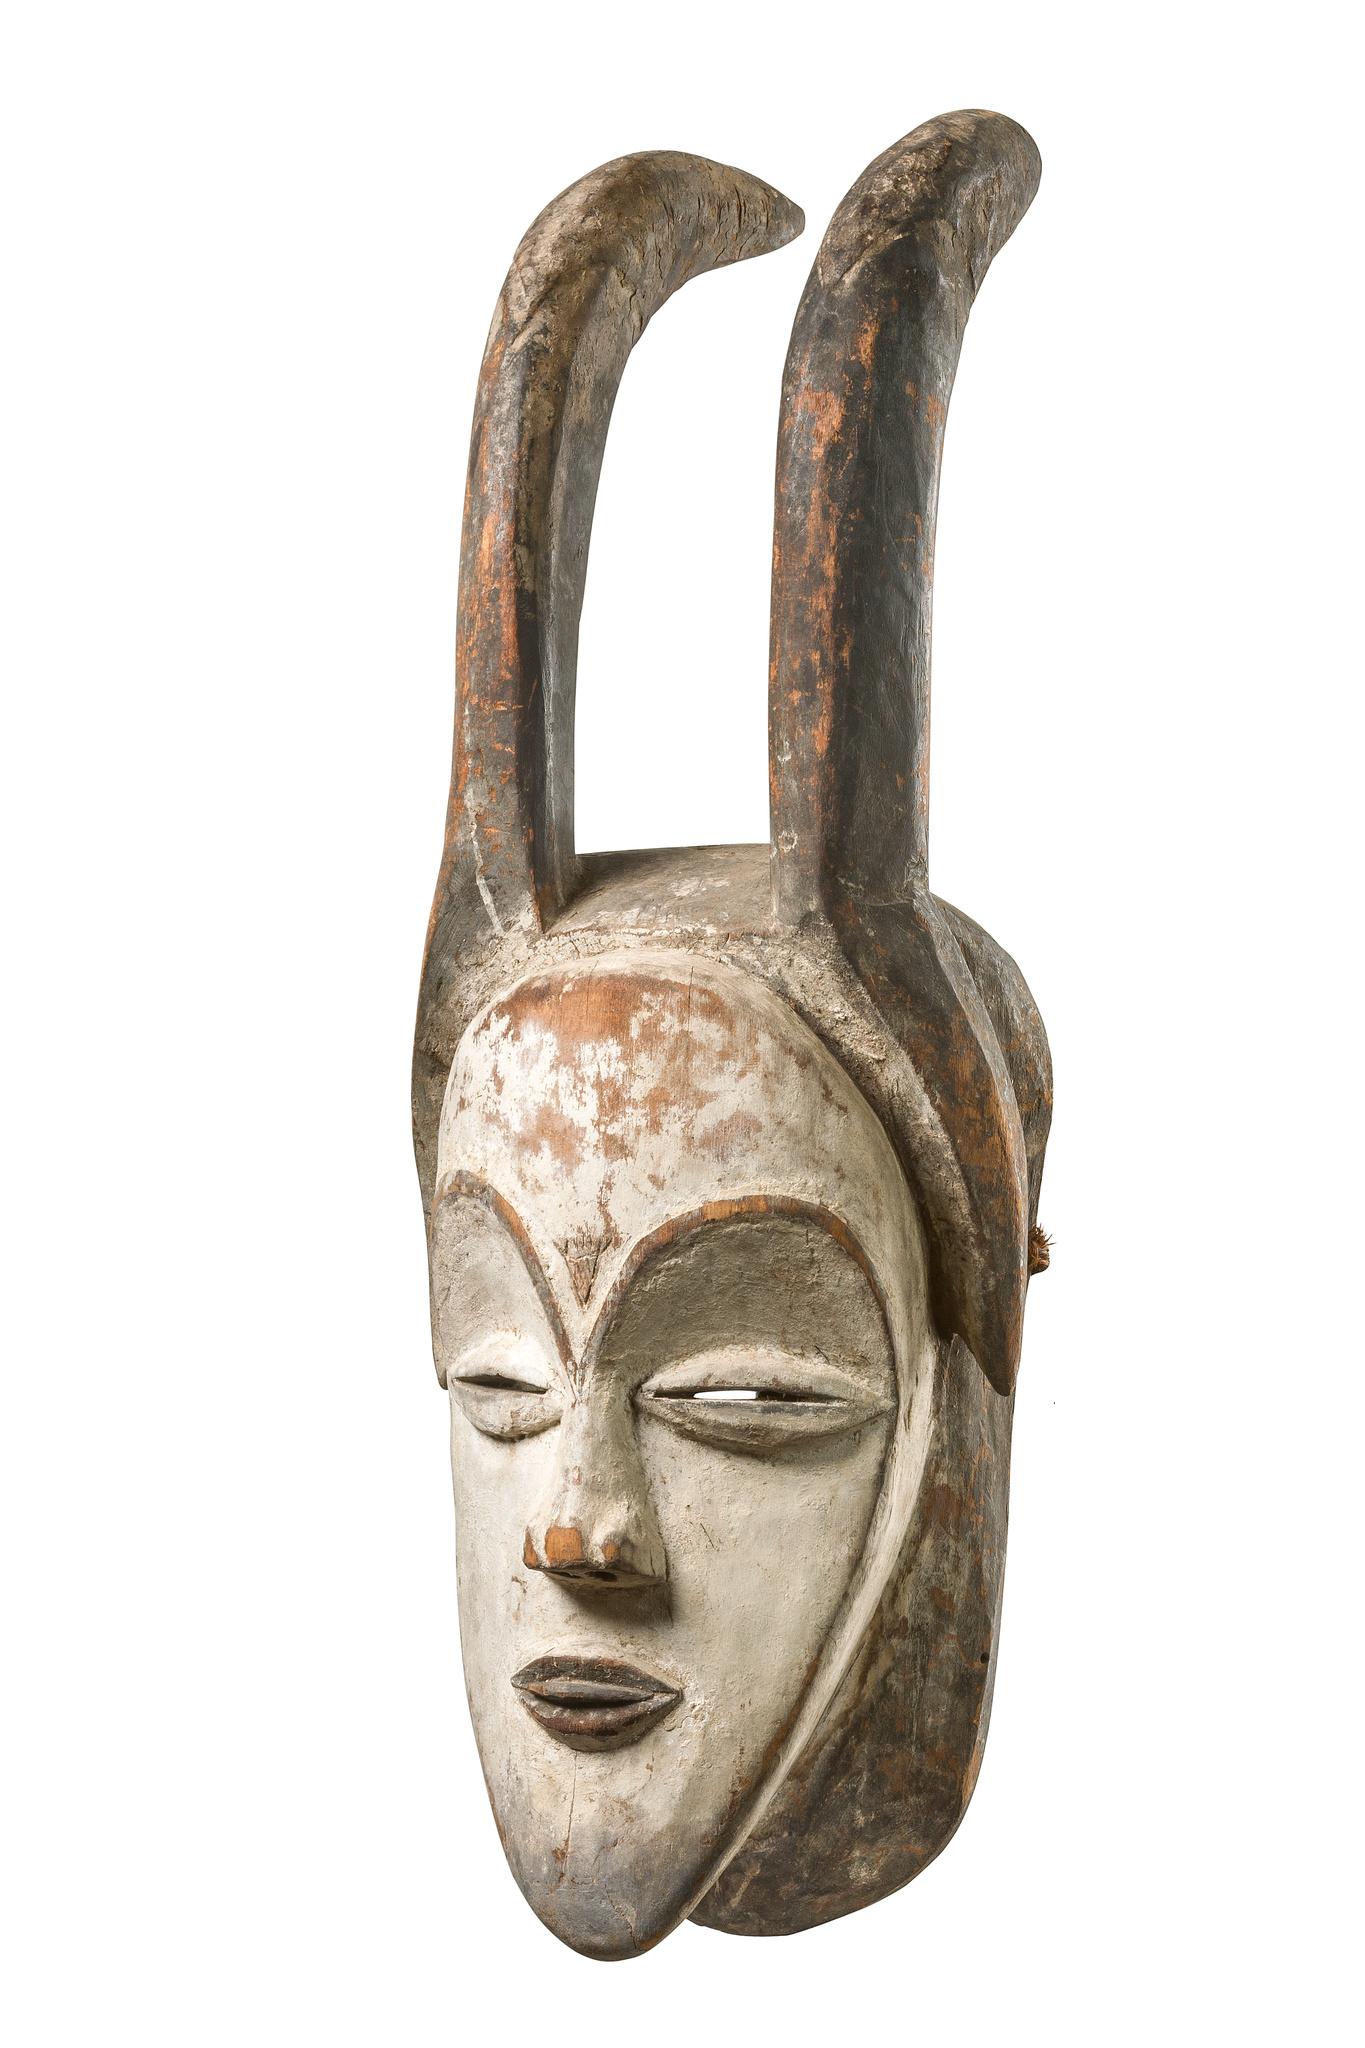 Anthropo-zoomorphic mask